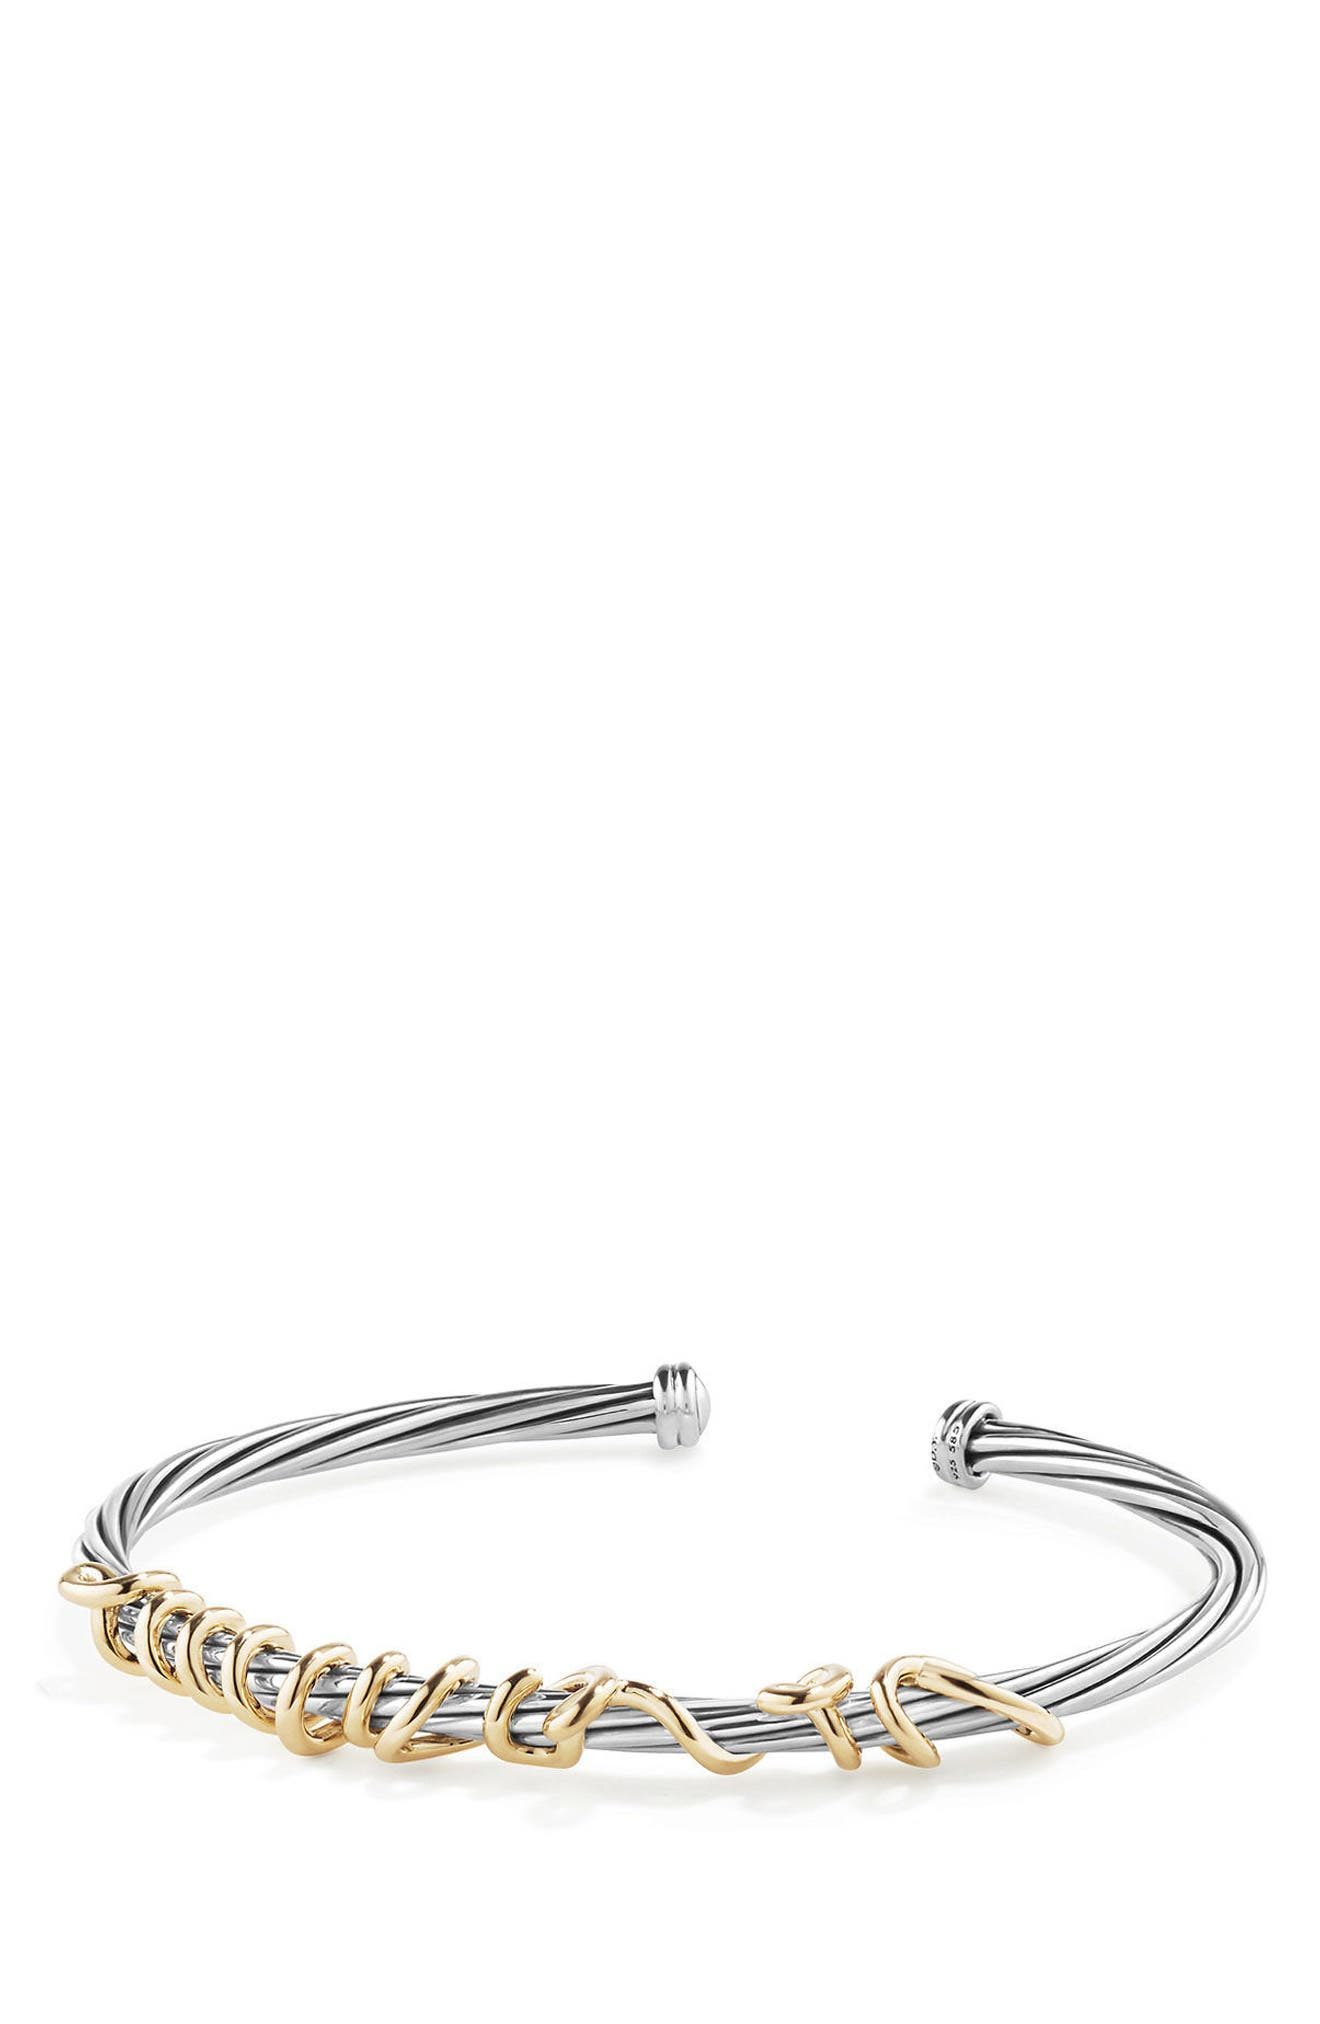 Main Image - David Yurman DY Whispers Je T'aime Bracelet with 14k Gold